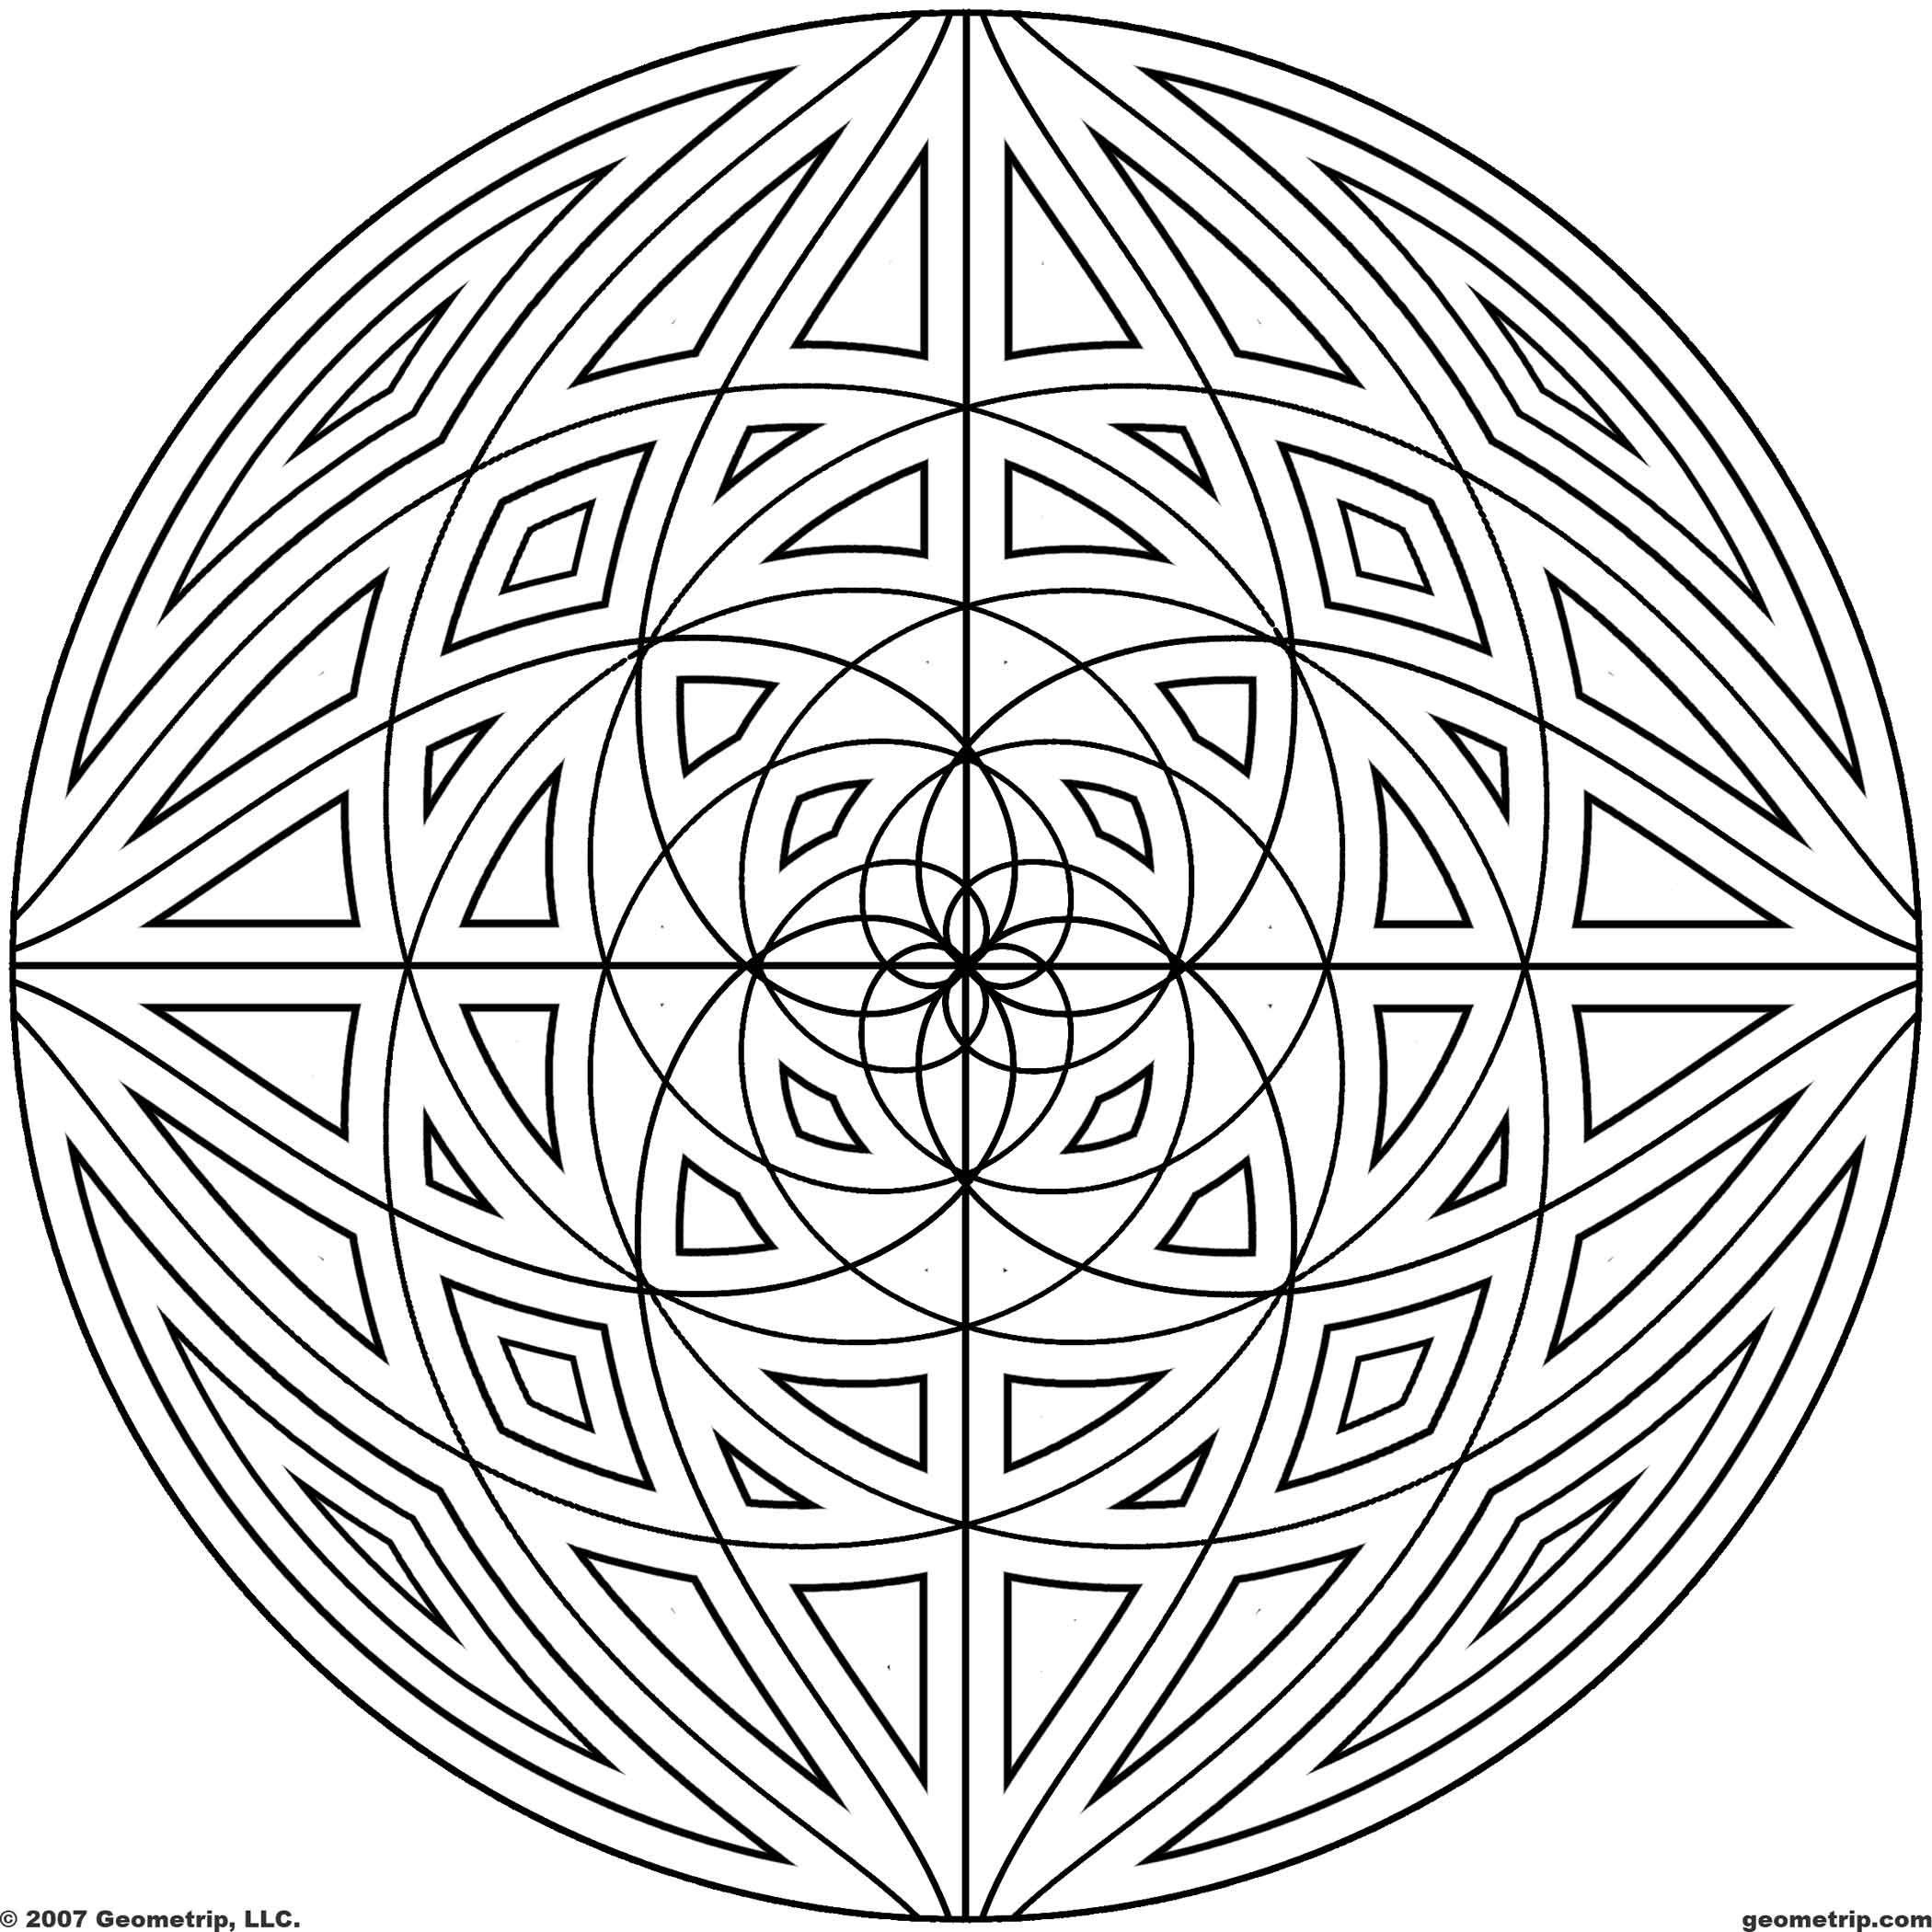 Geometrip Com Free Geometric Coloring Designs Circles Geometric Coloring Pages Designs Coloring Books Mandala Coloring Pages